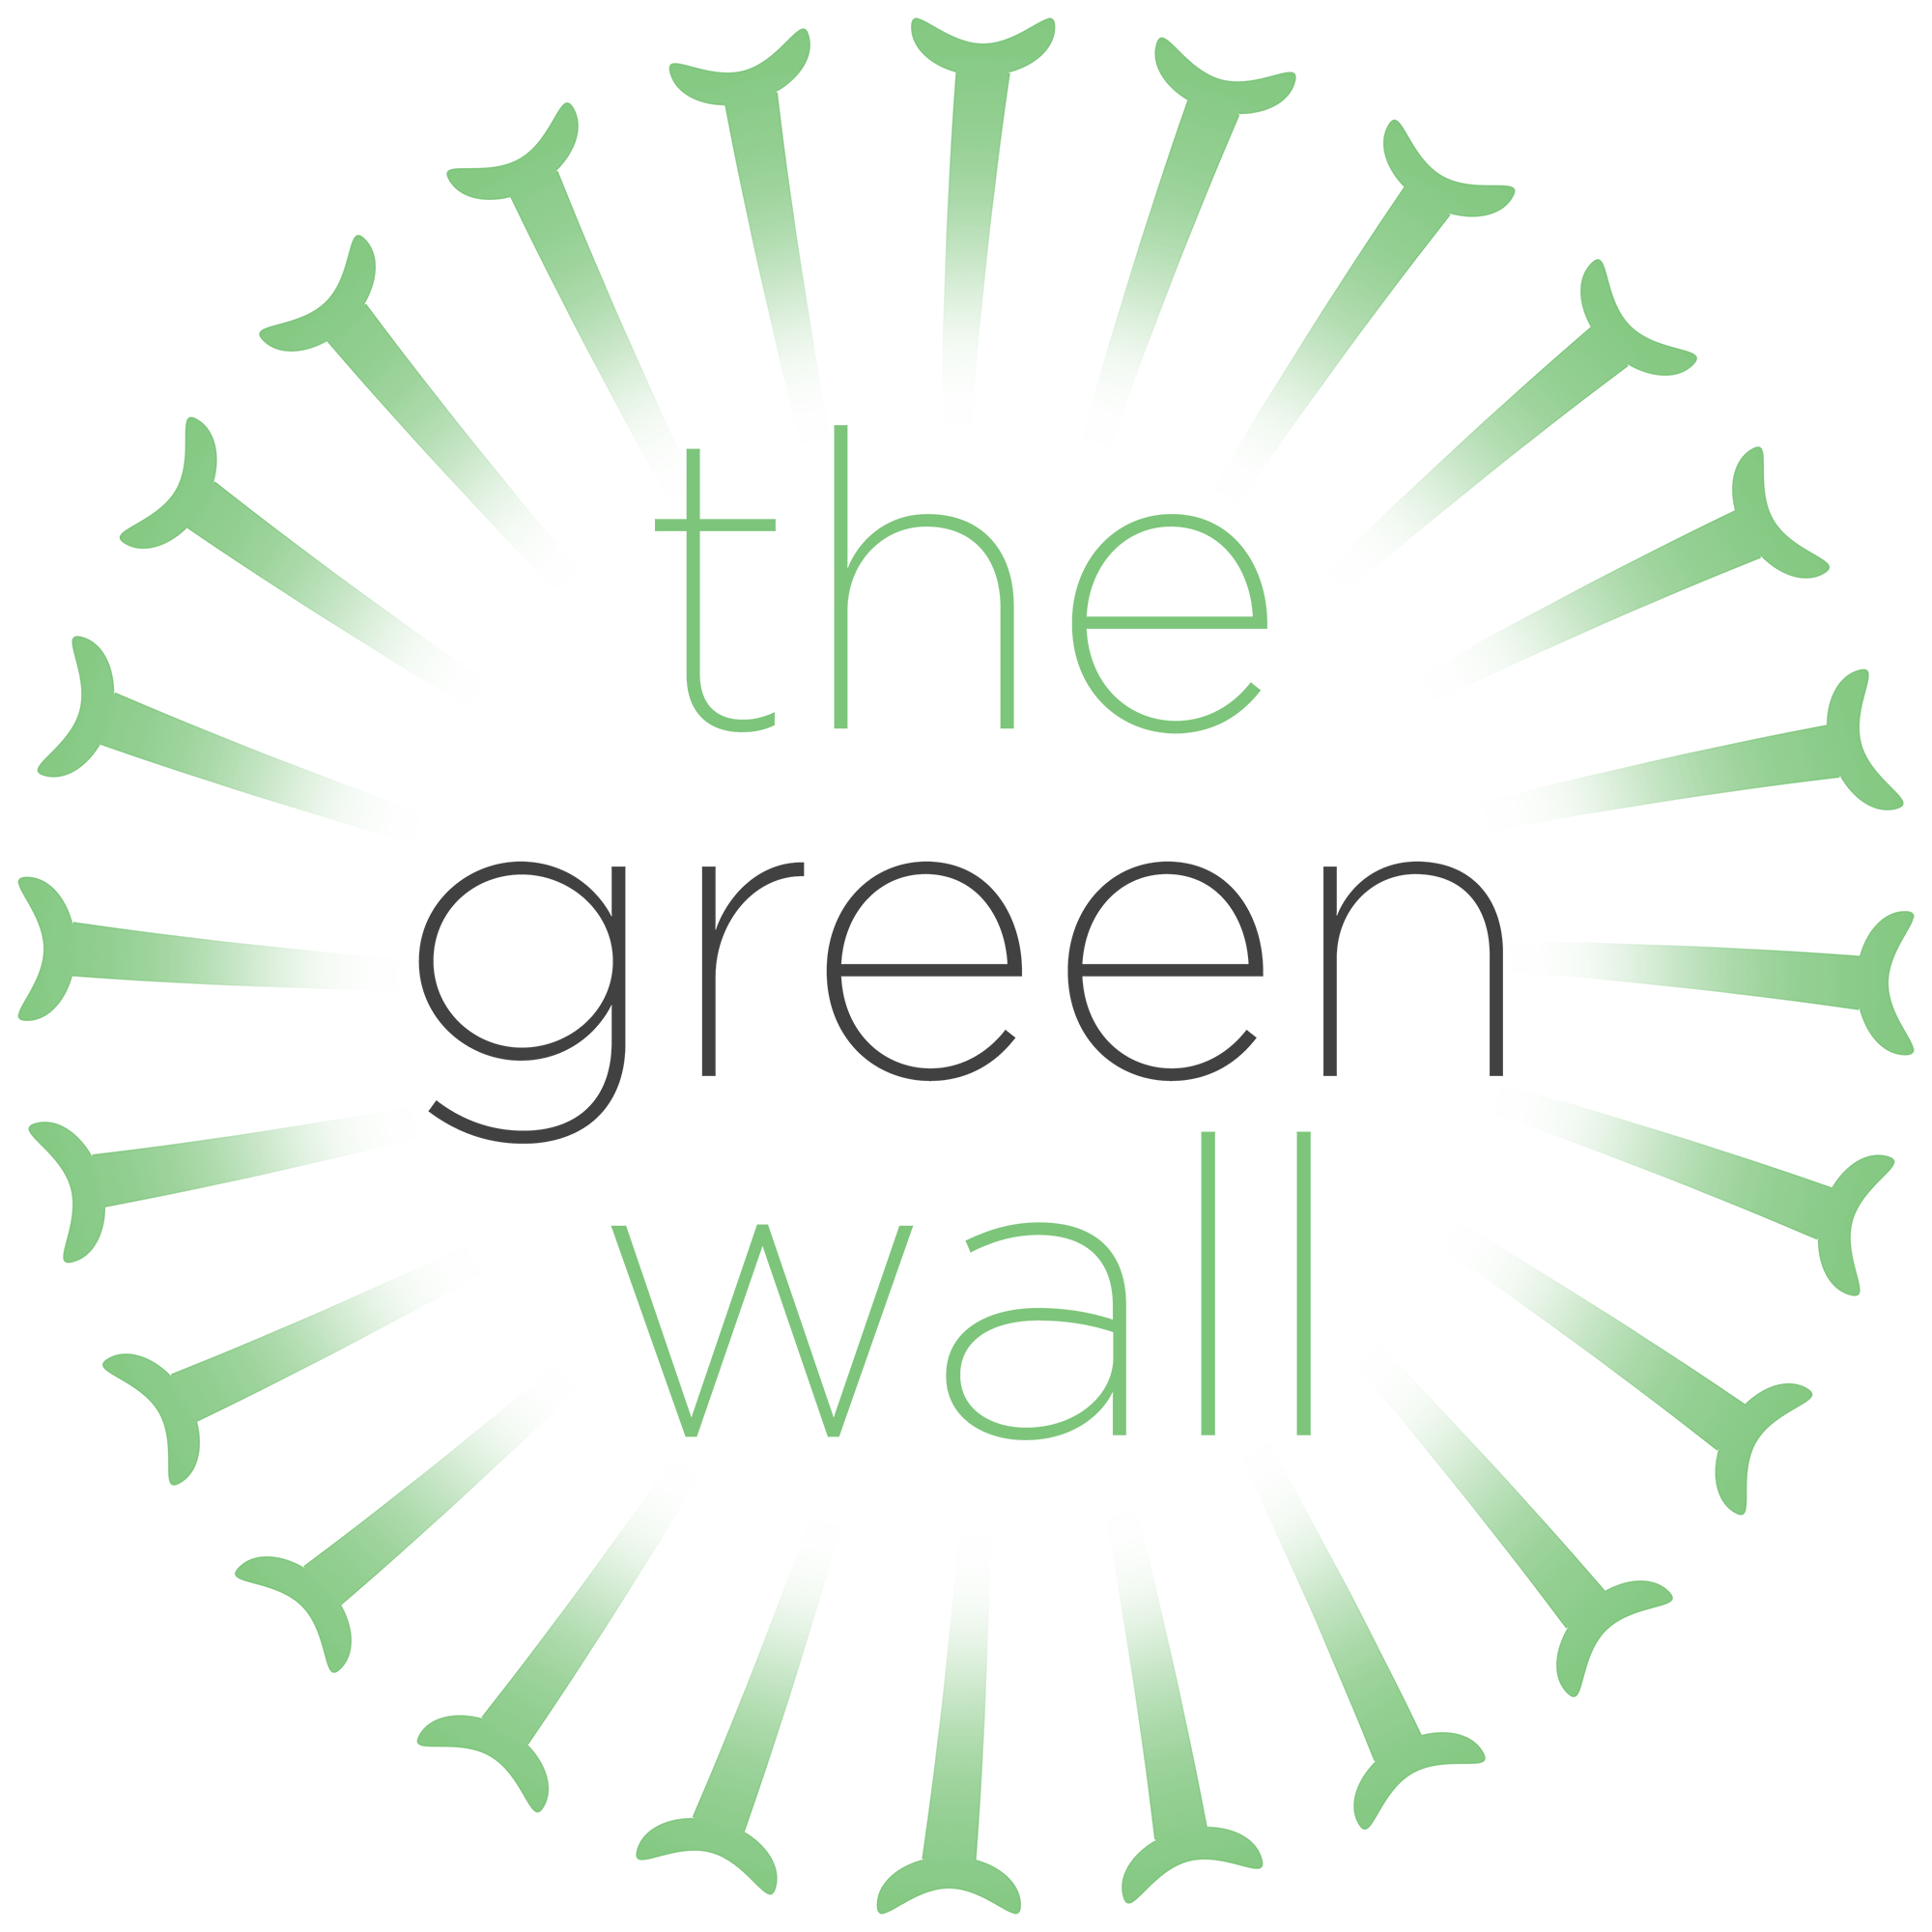 Avatar - The Green Wall